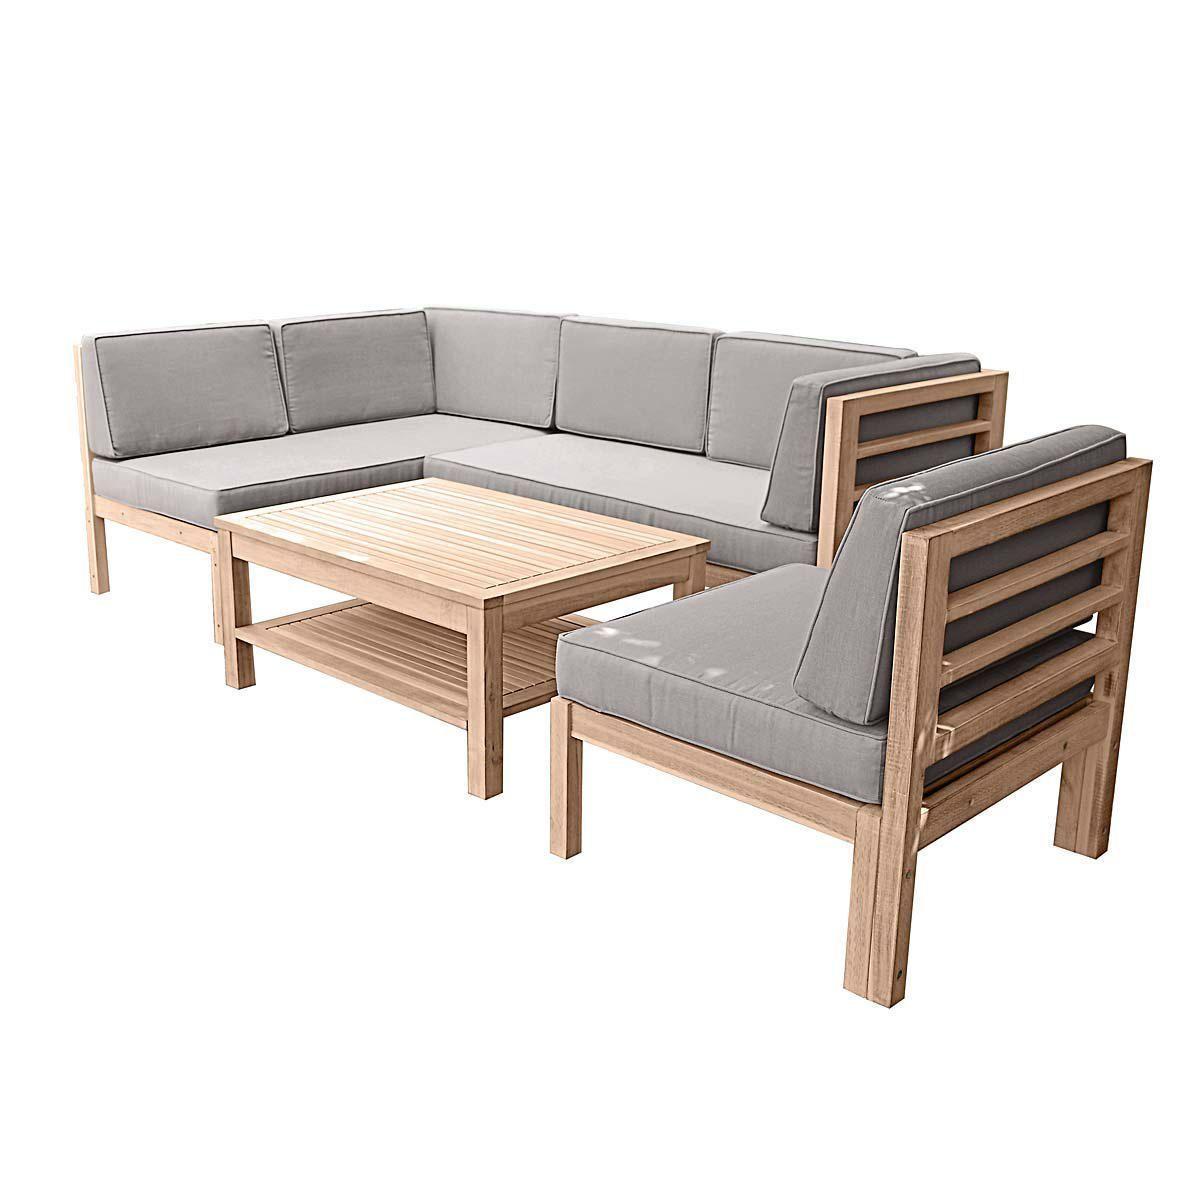 Gartenmöbel Set Holz 3-tlg | Articles and Detail